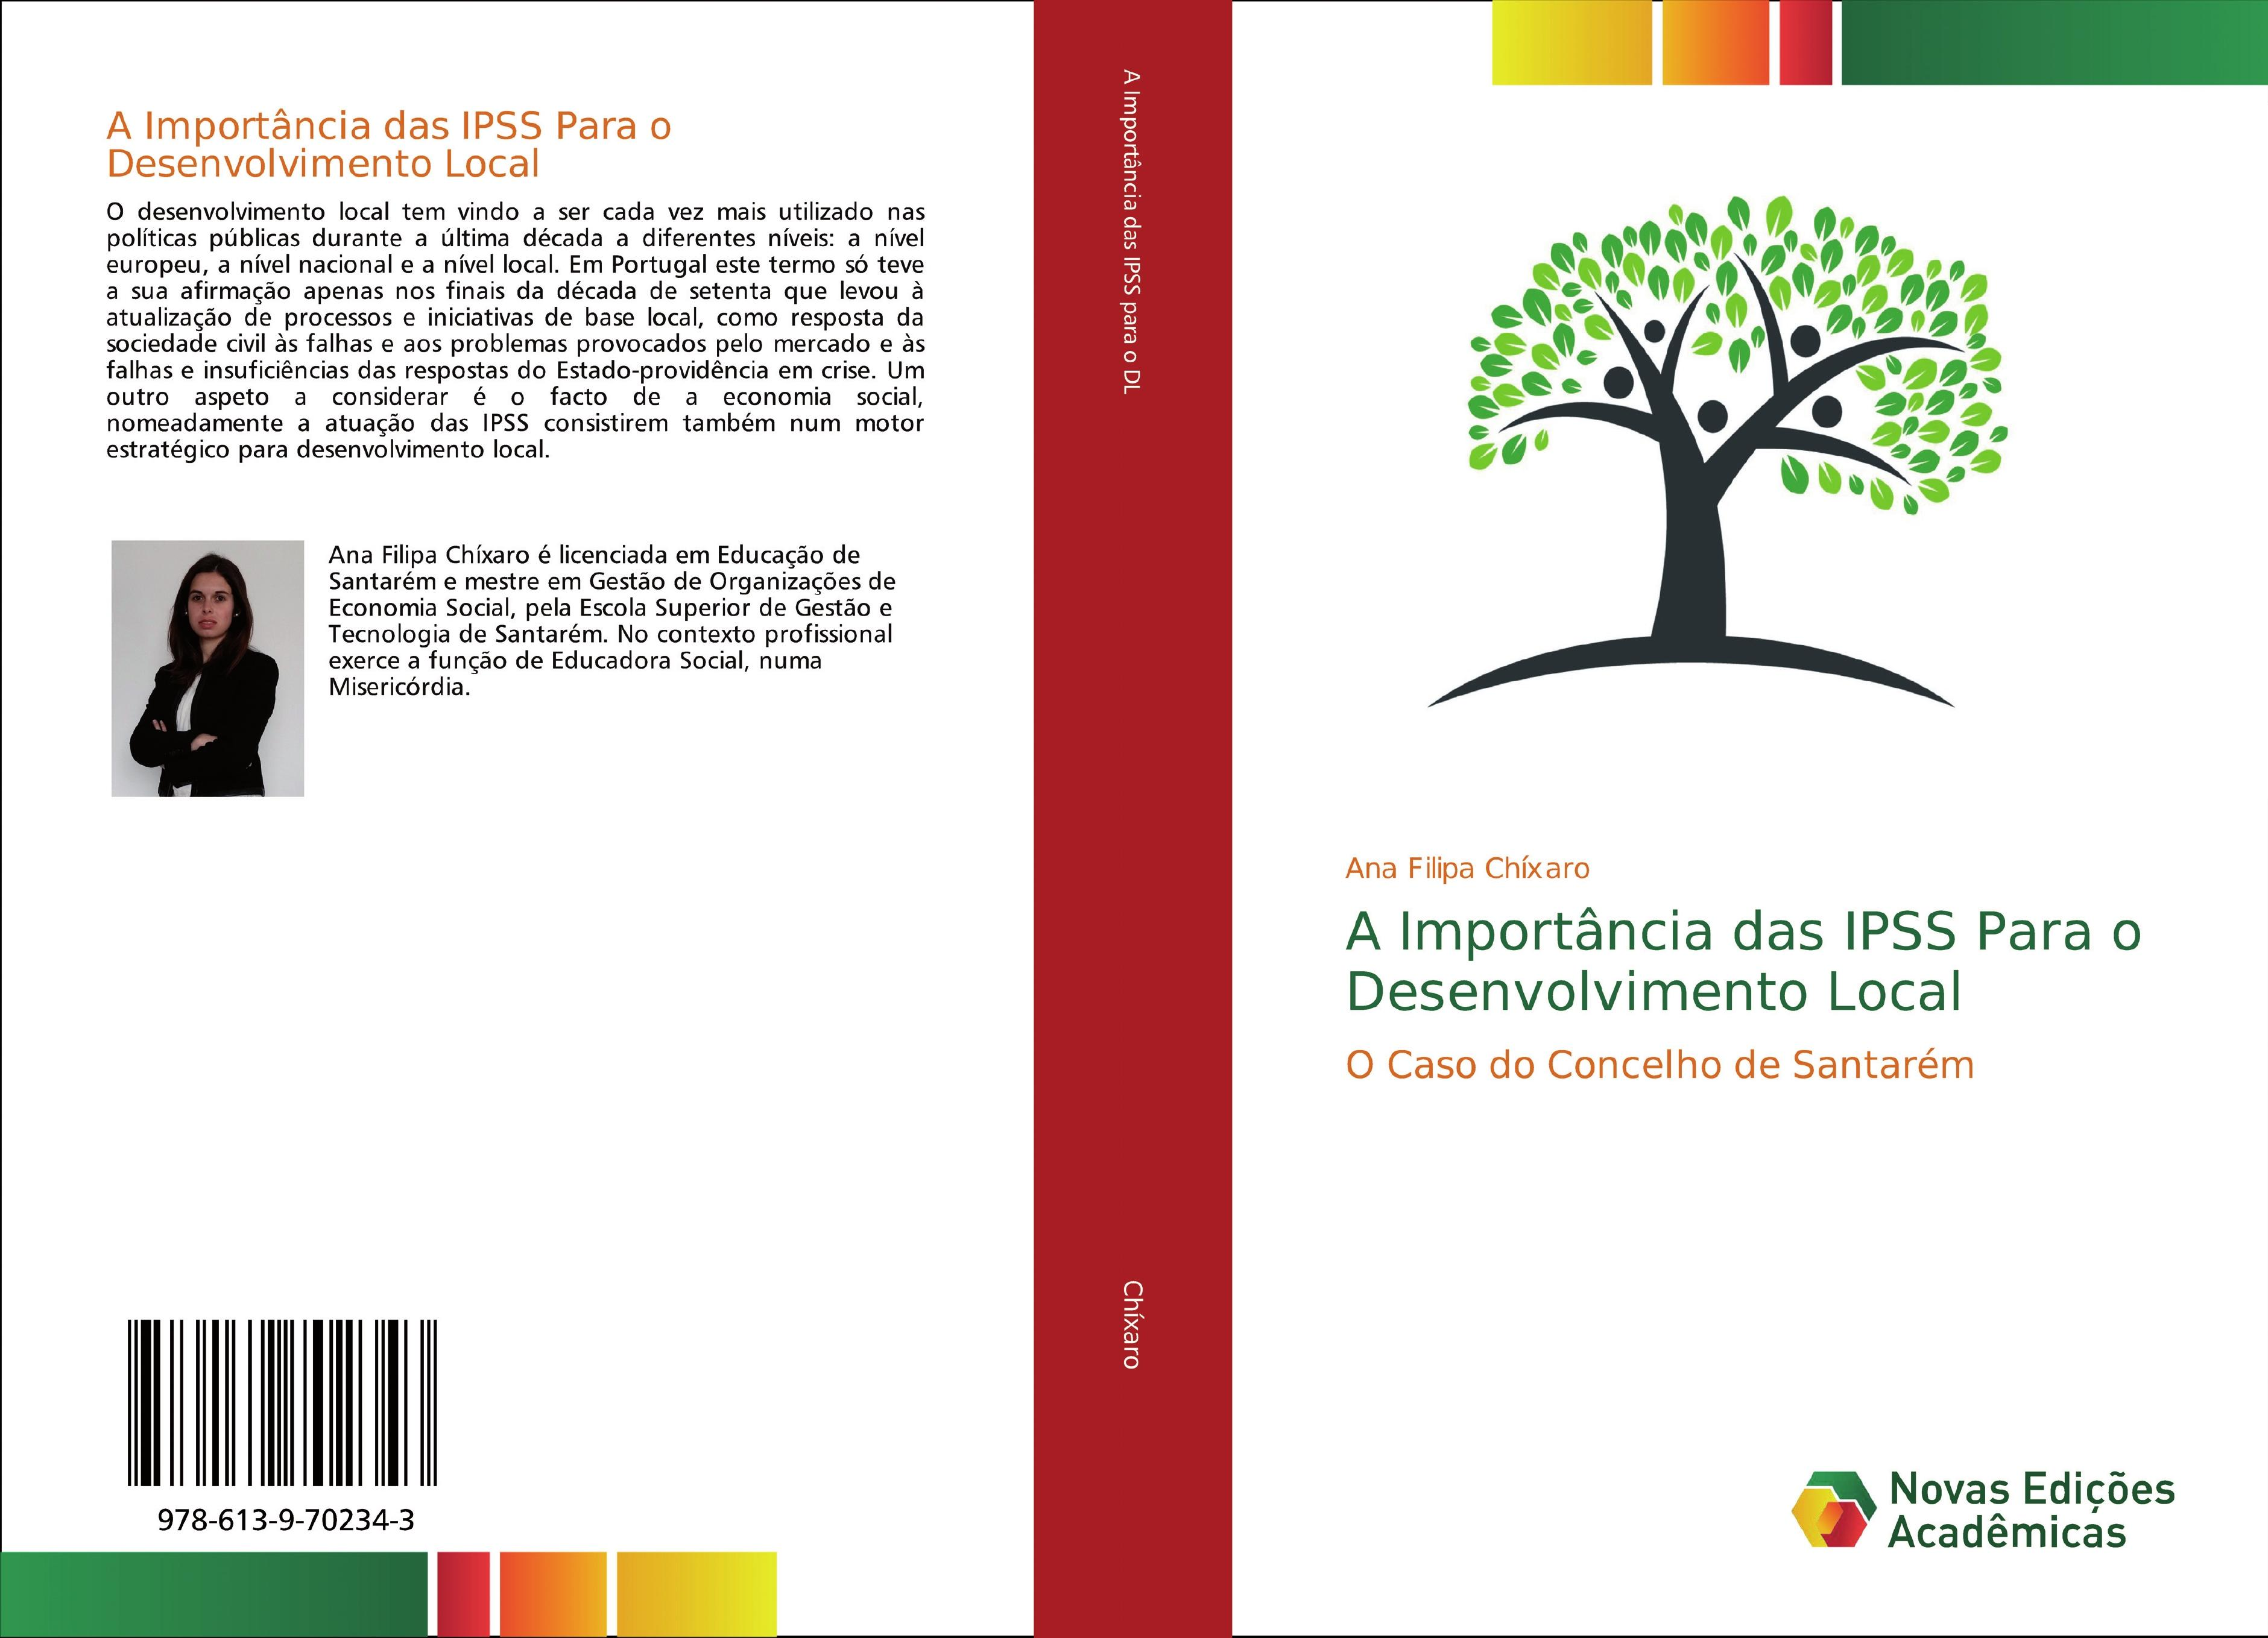 A Importância das IPSS Para o Desenvolvimento Local  Ana Filipa Chíxaro  Taschenbuch  Portugiesisch  2018 - Chíxaro, Ana Filipa